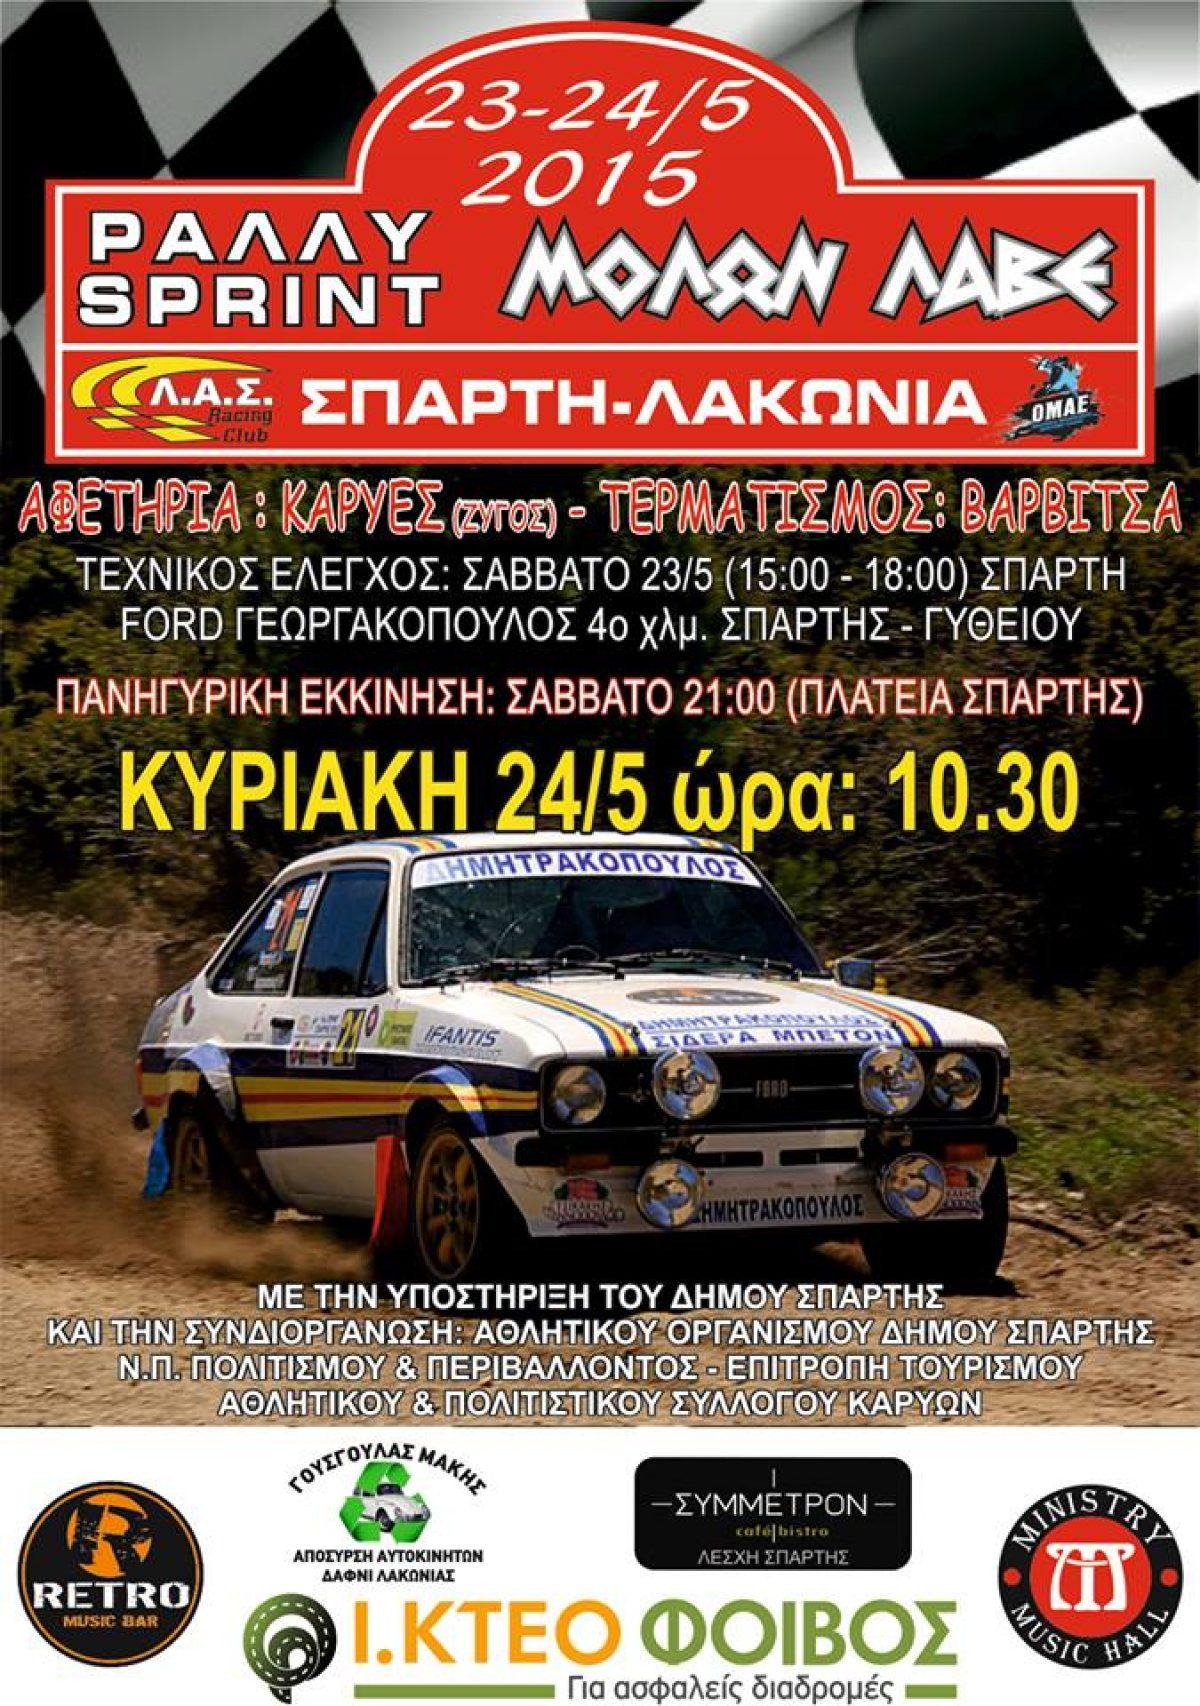 "Mε 34 συμμετοχές … το Rally Sprint ""ΜΟΛΩΝ ΛΑΒΕ"" 2015!"